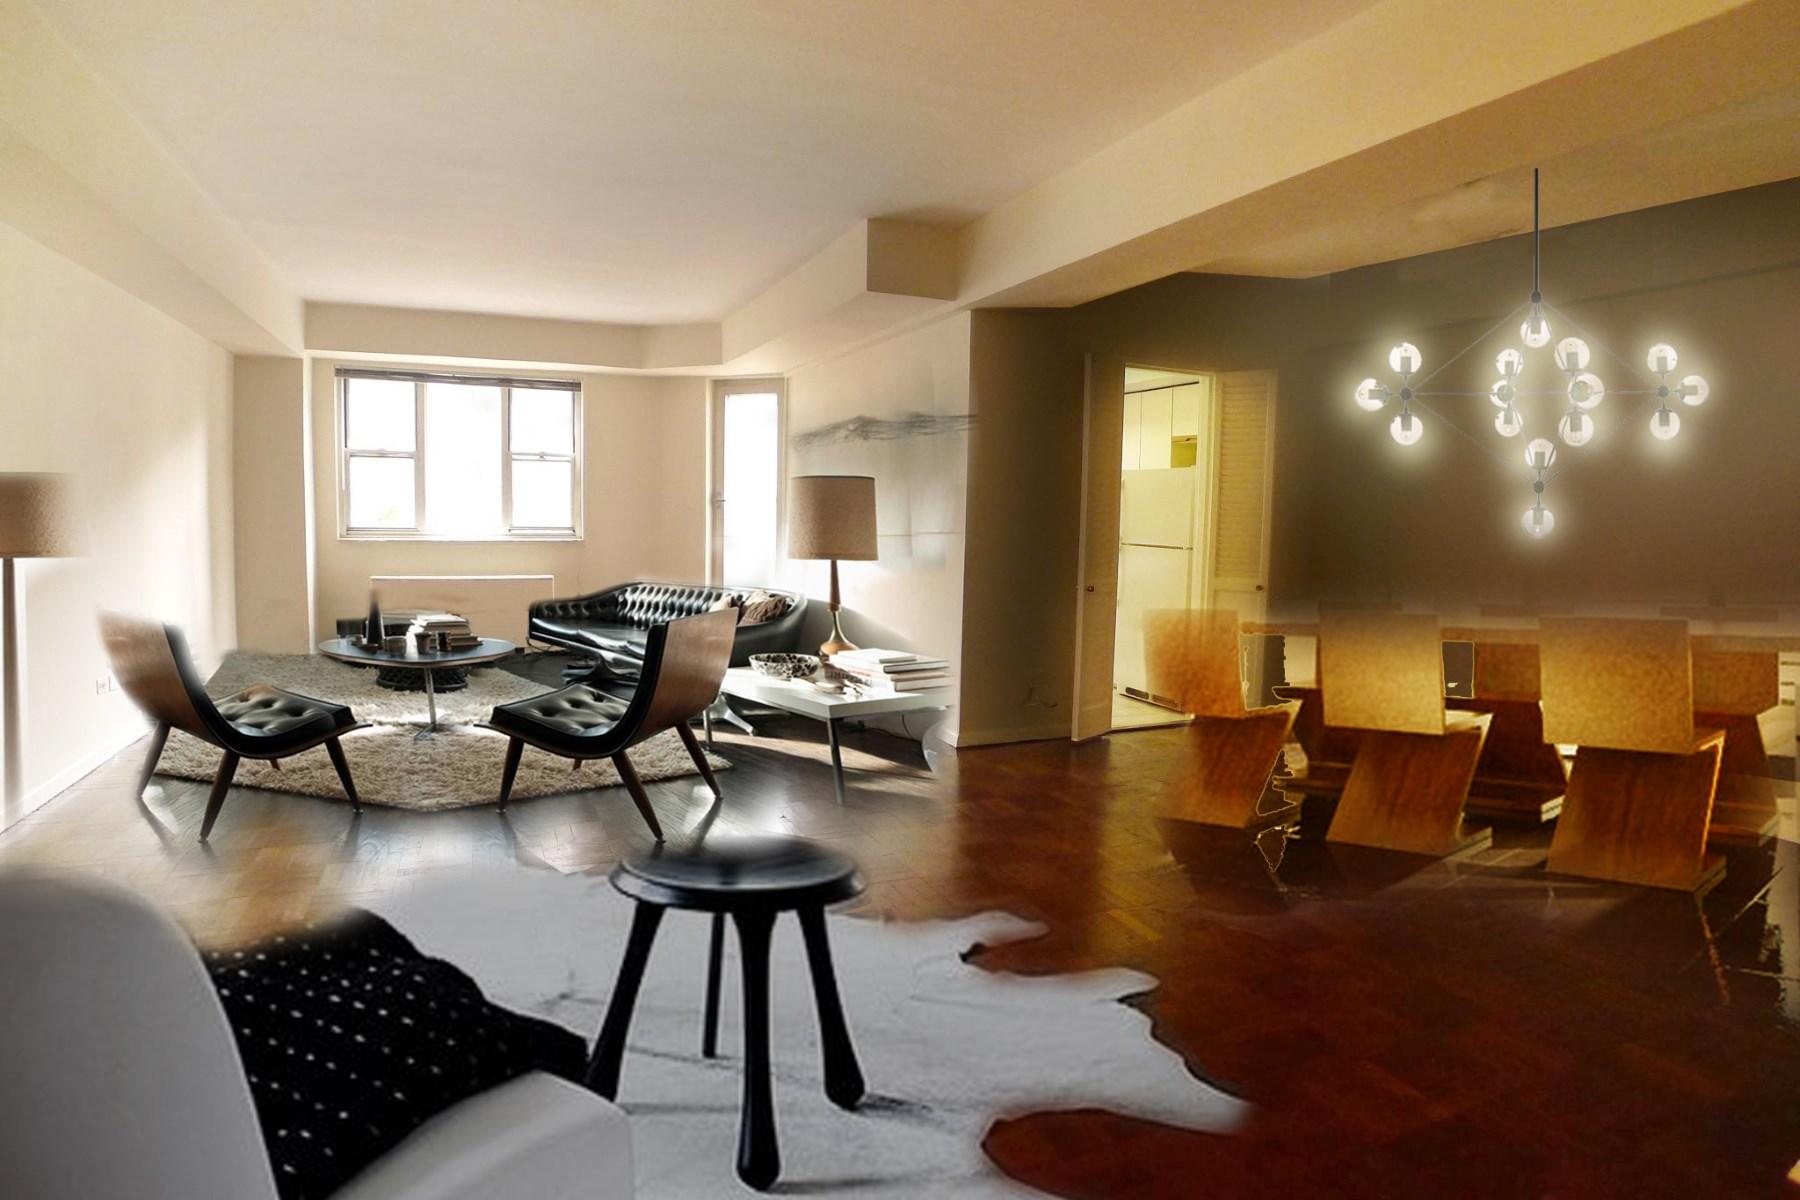 Кооперативная квартира для того Продажа на Midtown High Floor with Terrace 100 West 57th Street Apt 19e New York, Нью-Йорк 10019 Соединенные Штаты